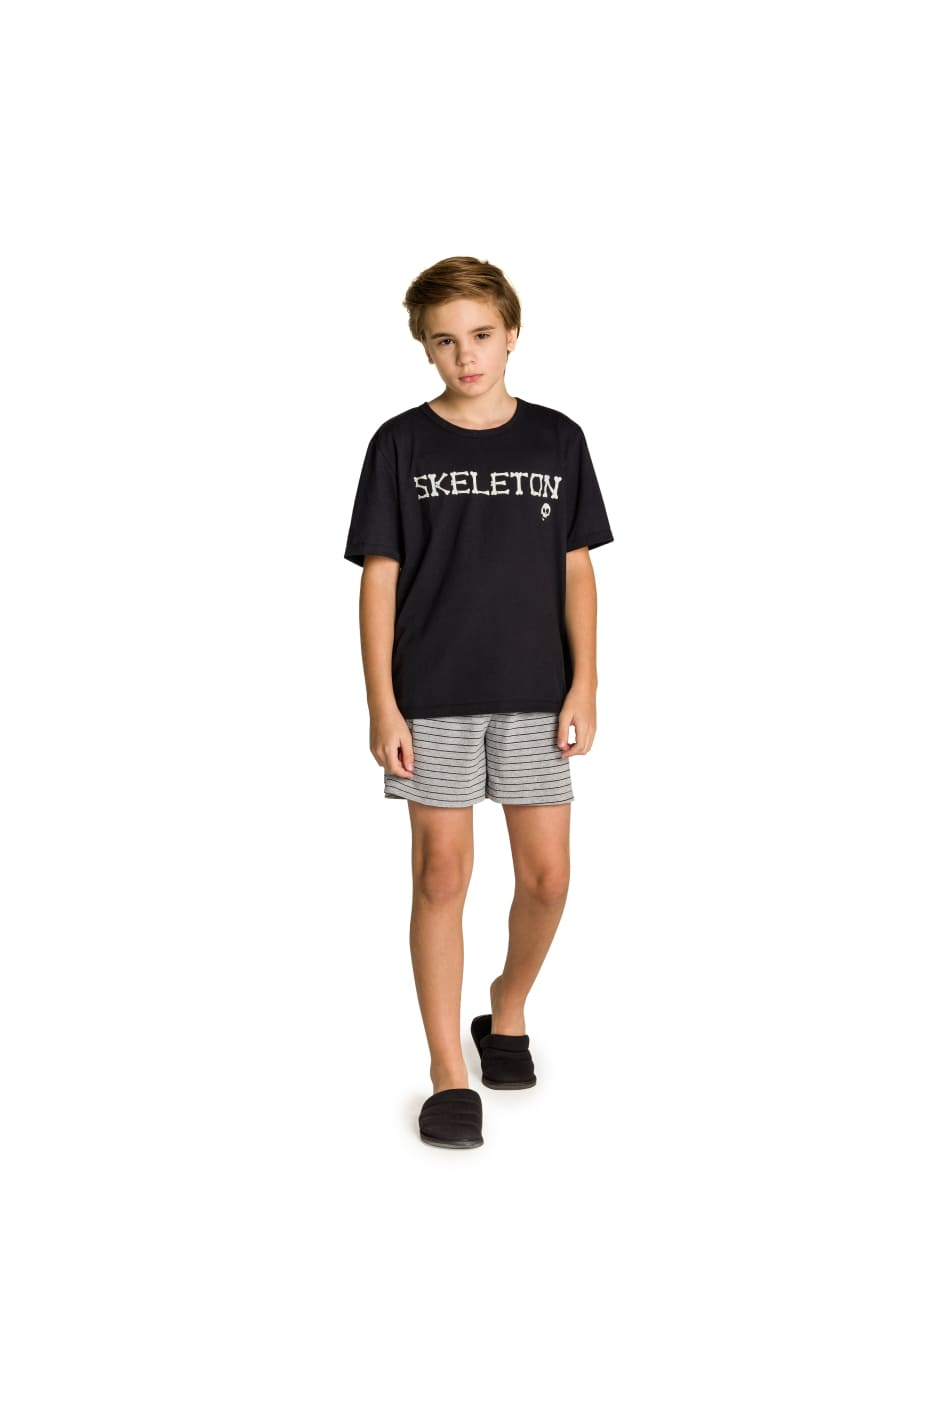 018/E - Pijama Juvenil Masculino Família Skeleton - Brilha no Escuro